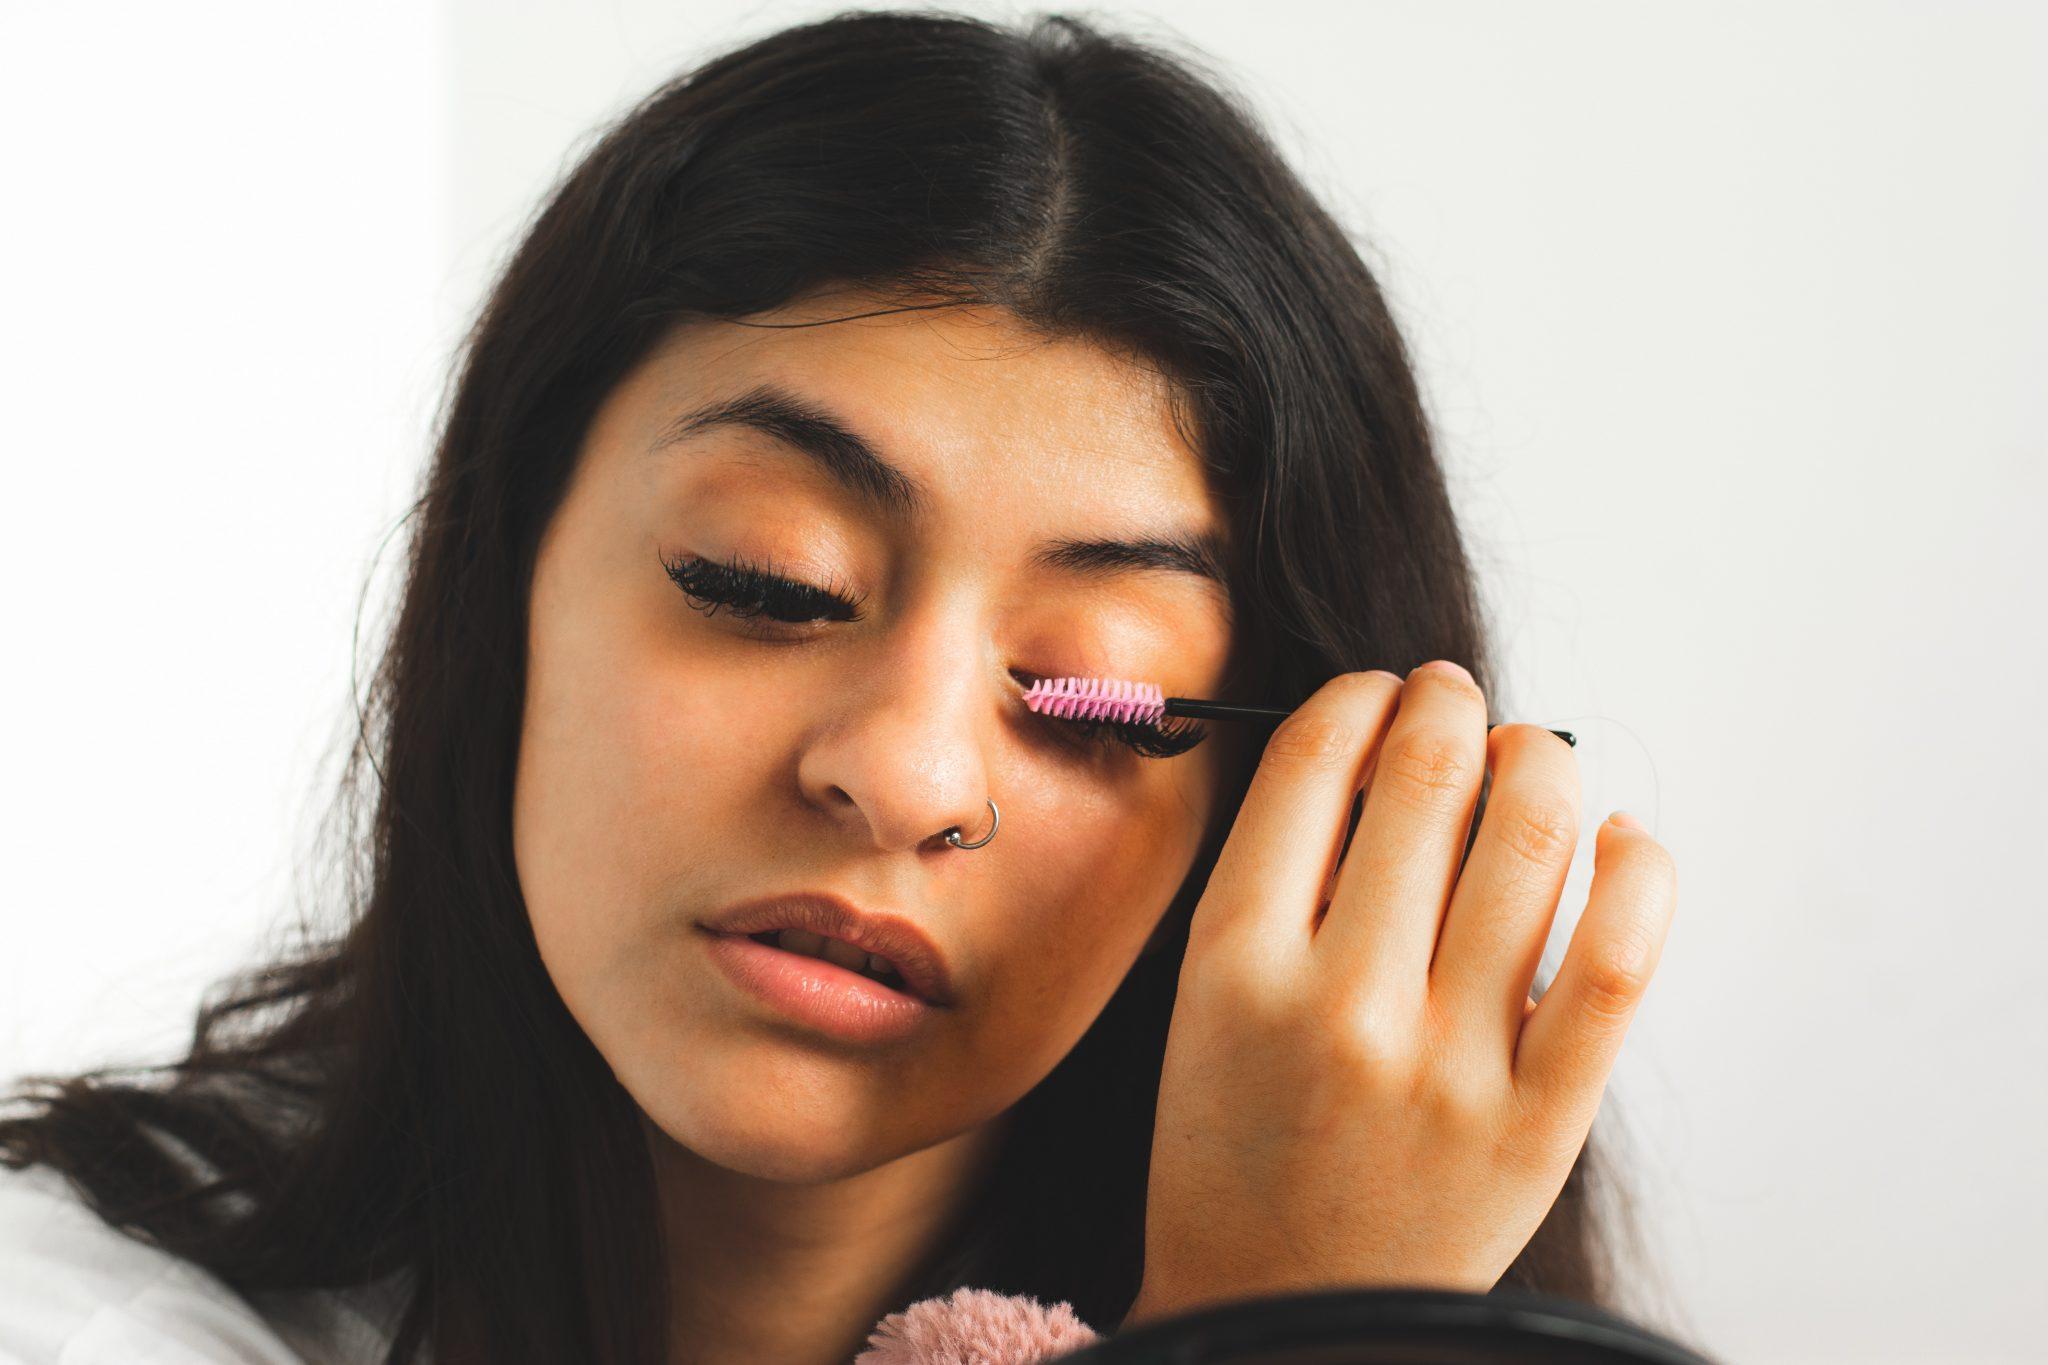 Woman with nose piercing is volumizing her eyelash using the mascara